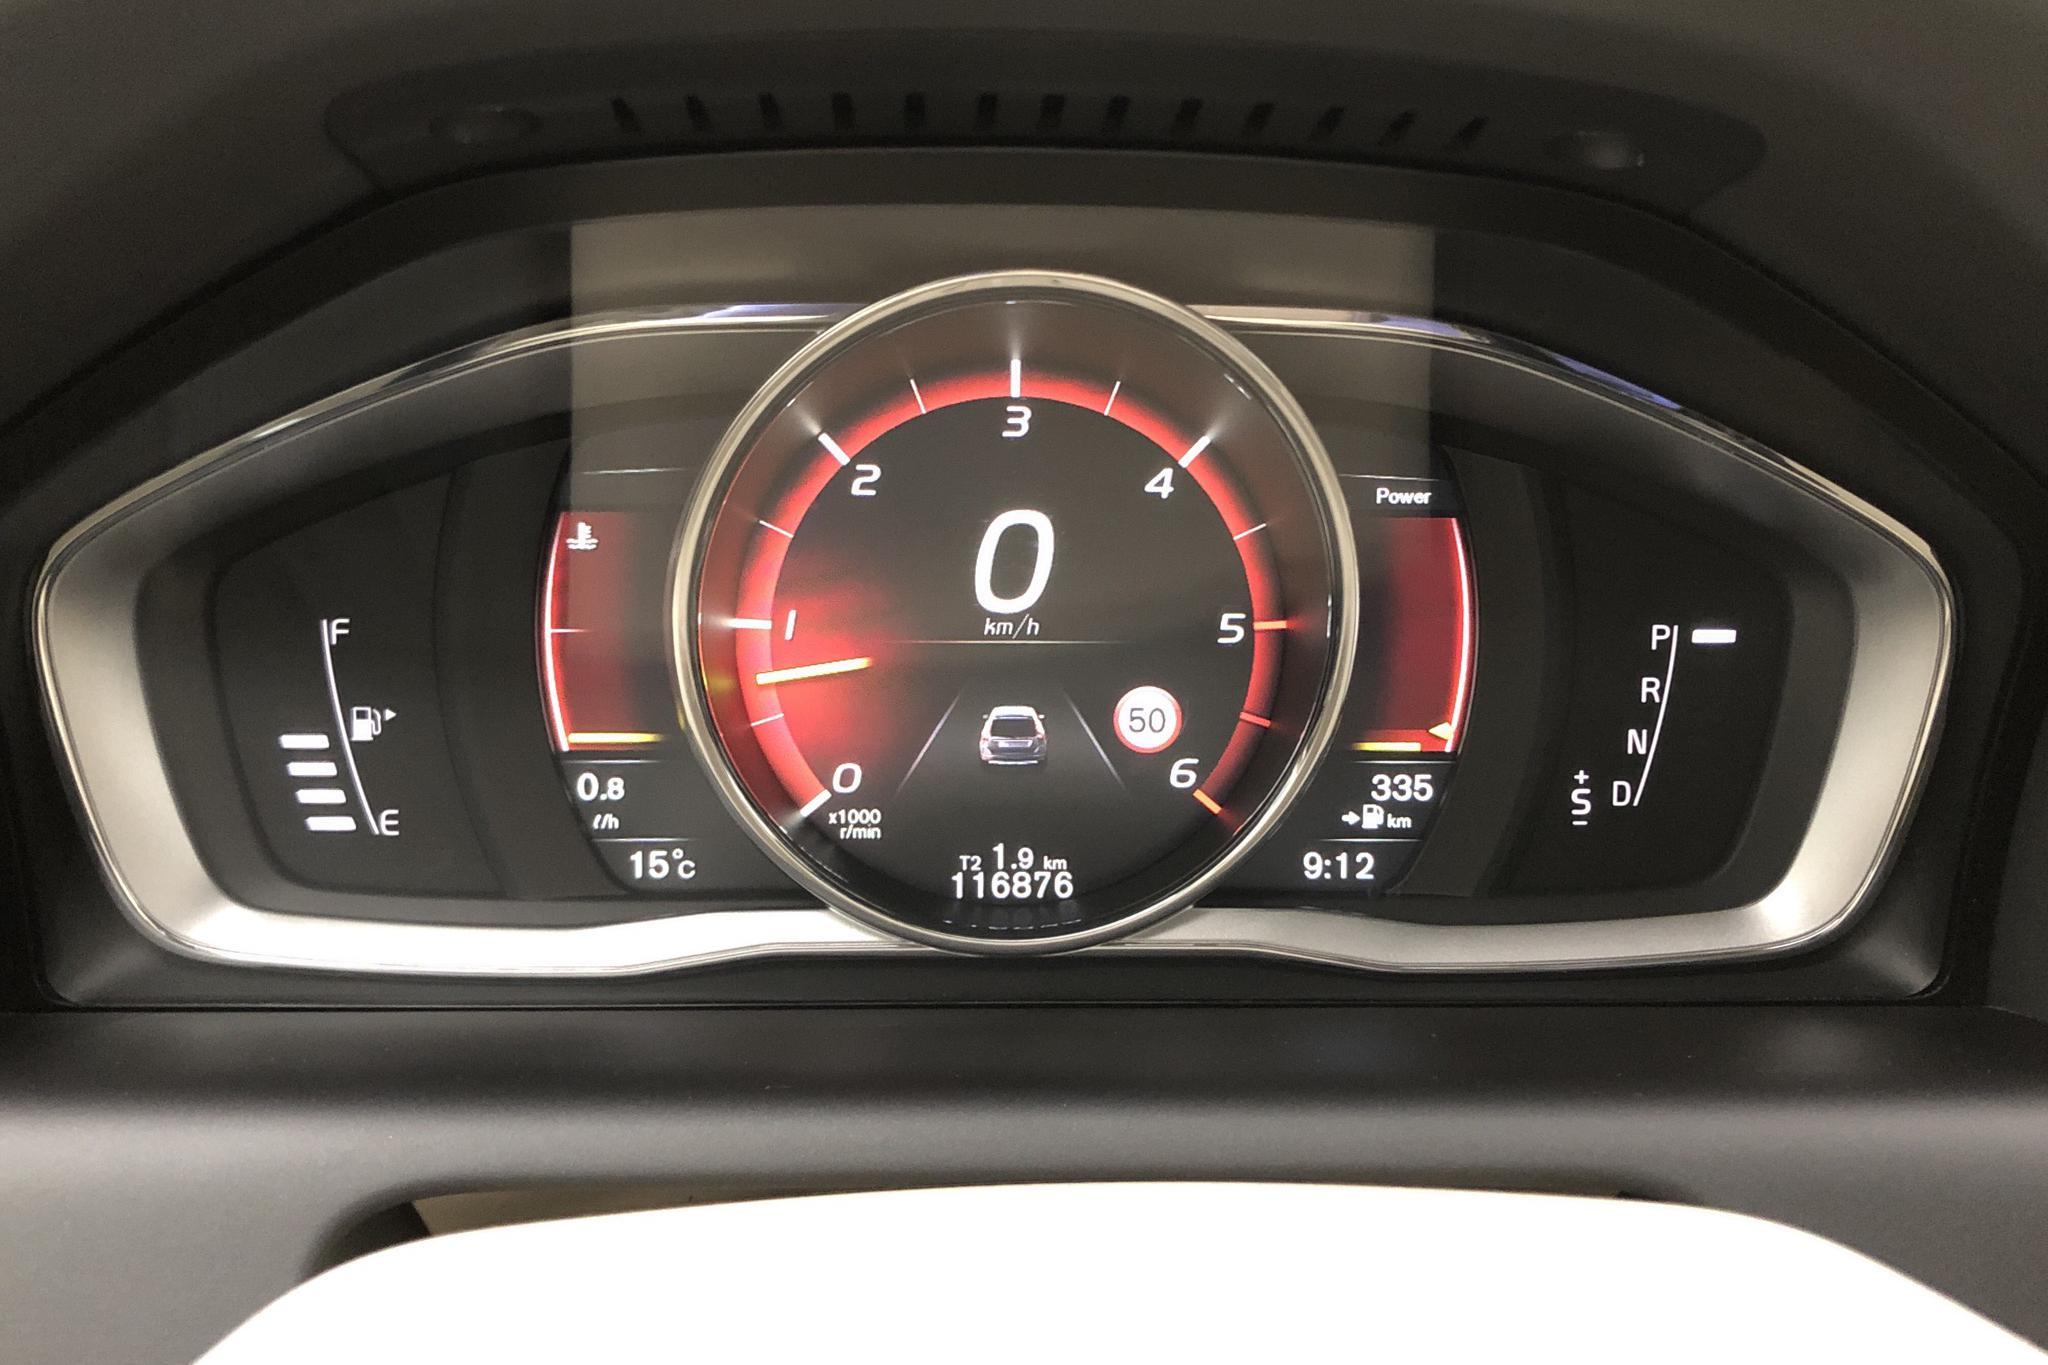 Volvo XC60 D4 AWD Classic Summum Pro(220hk) - 116 870 km - Automatic - Light Brown - 2017